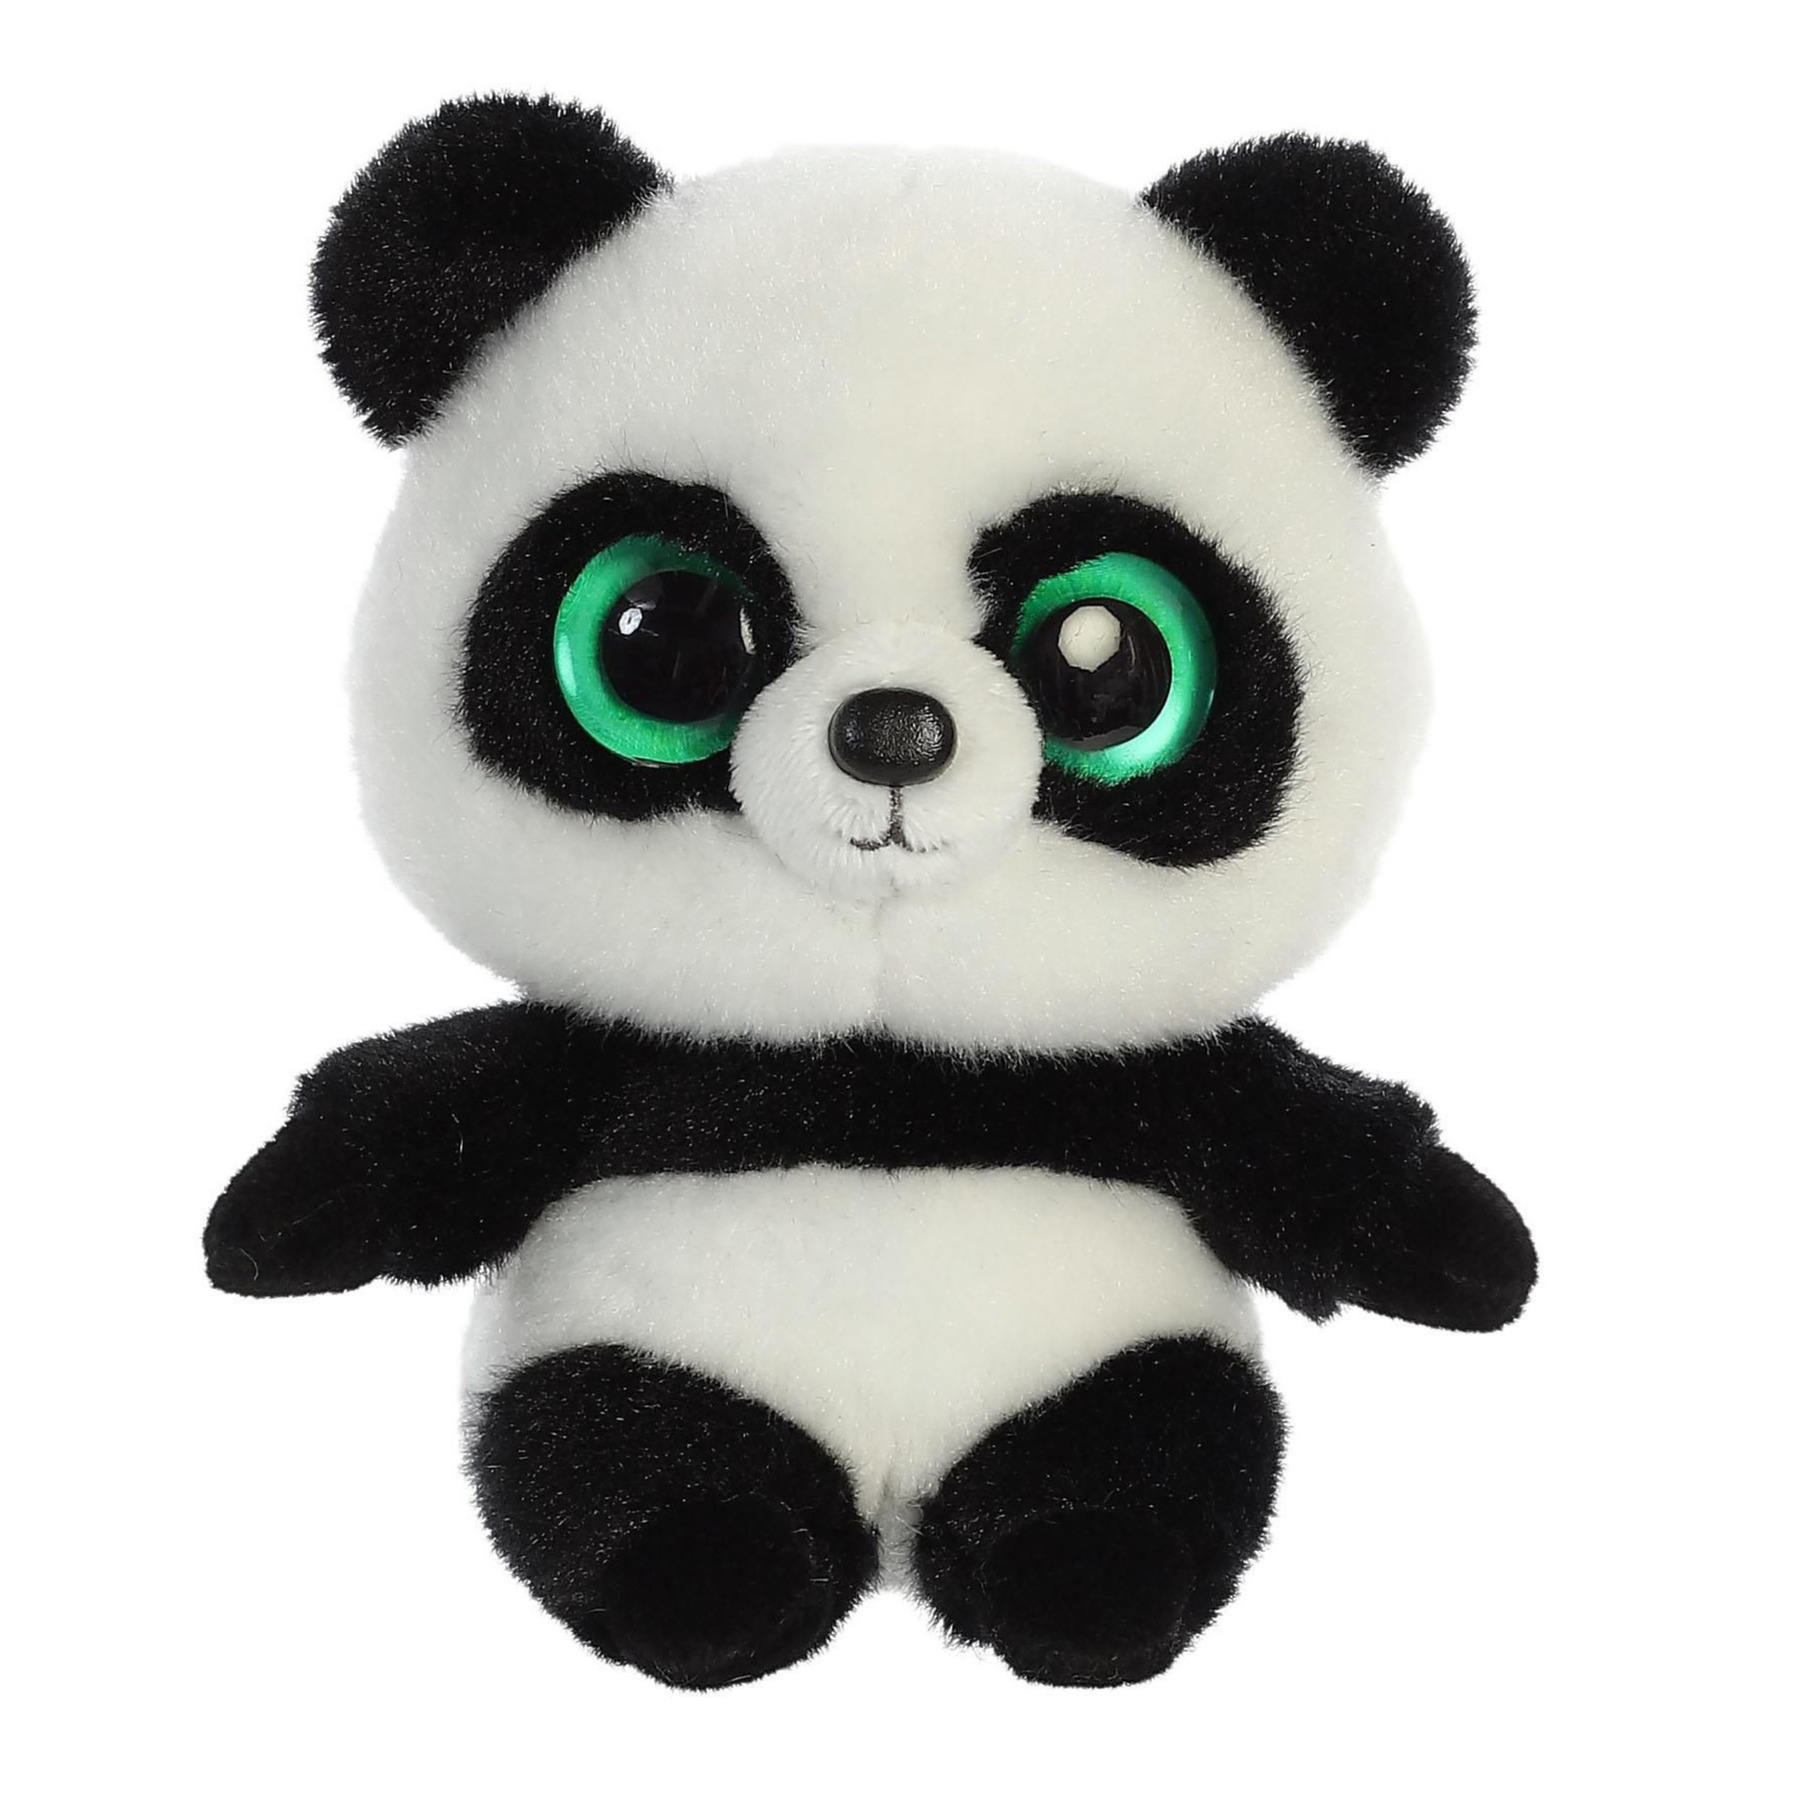 Pluche panda beer knuffel 15 cm